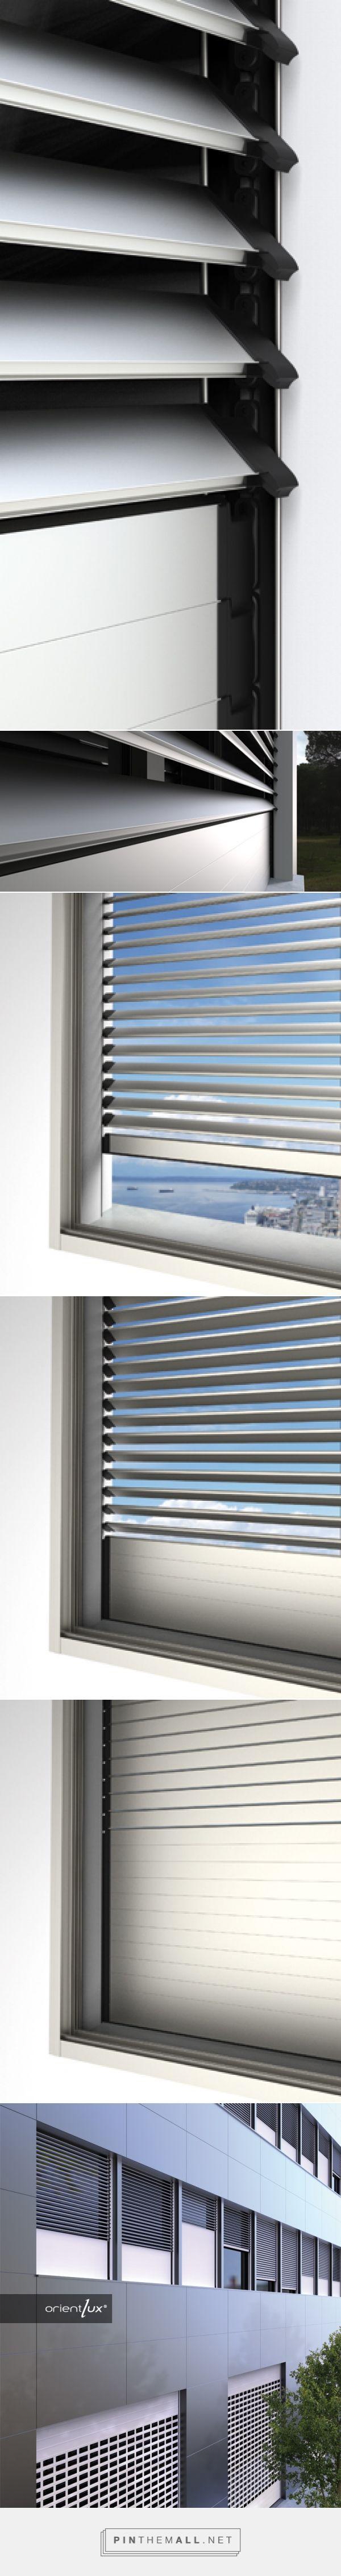 25 best ideas about persianas para ventanas on pinterest for Cortinas para puertas exteriores ikea